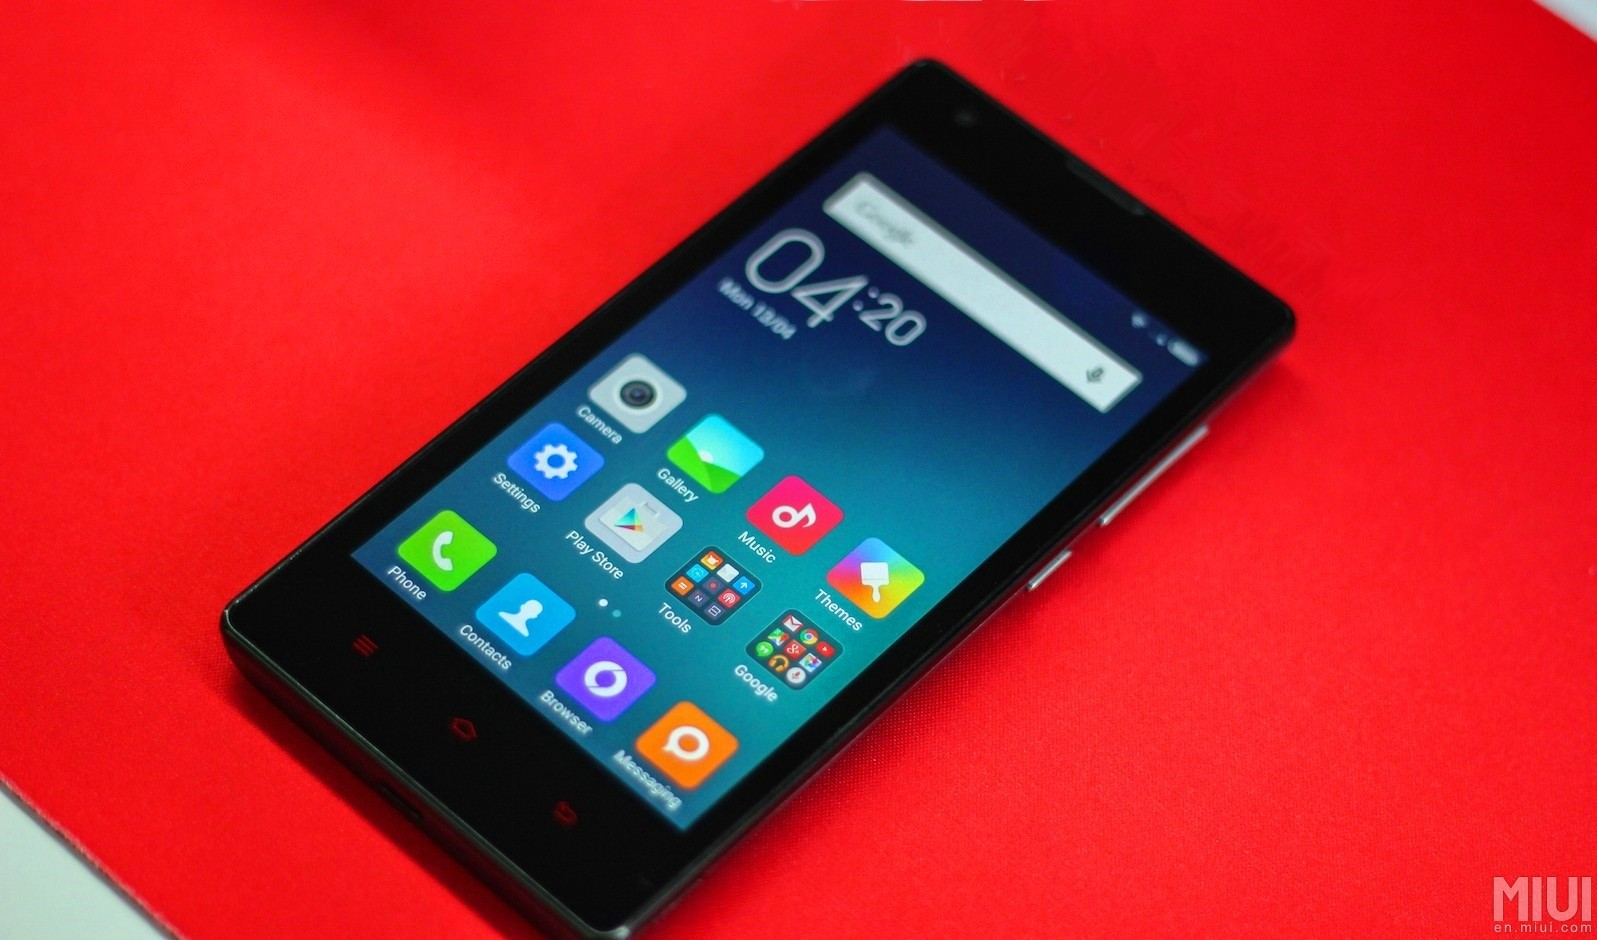 Xiaomi Announces MIUI 6 Beta for Redmi 1S Global Rollout